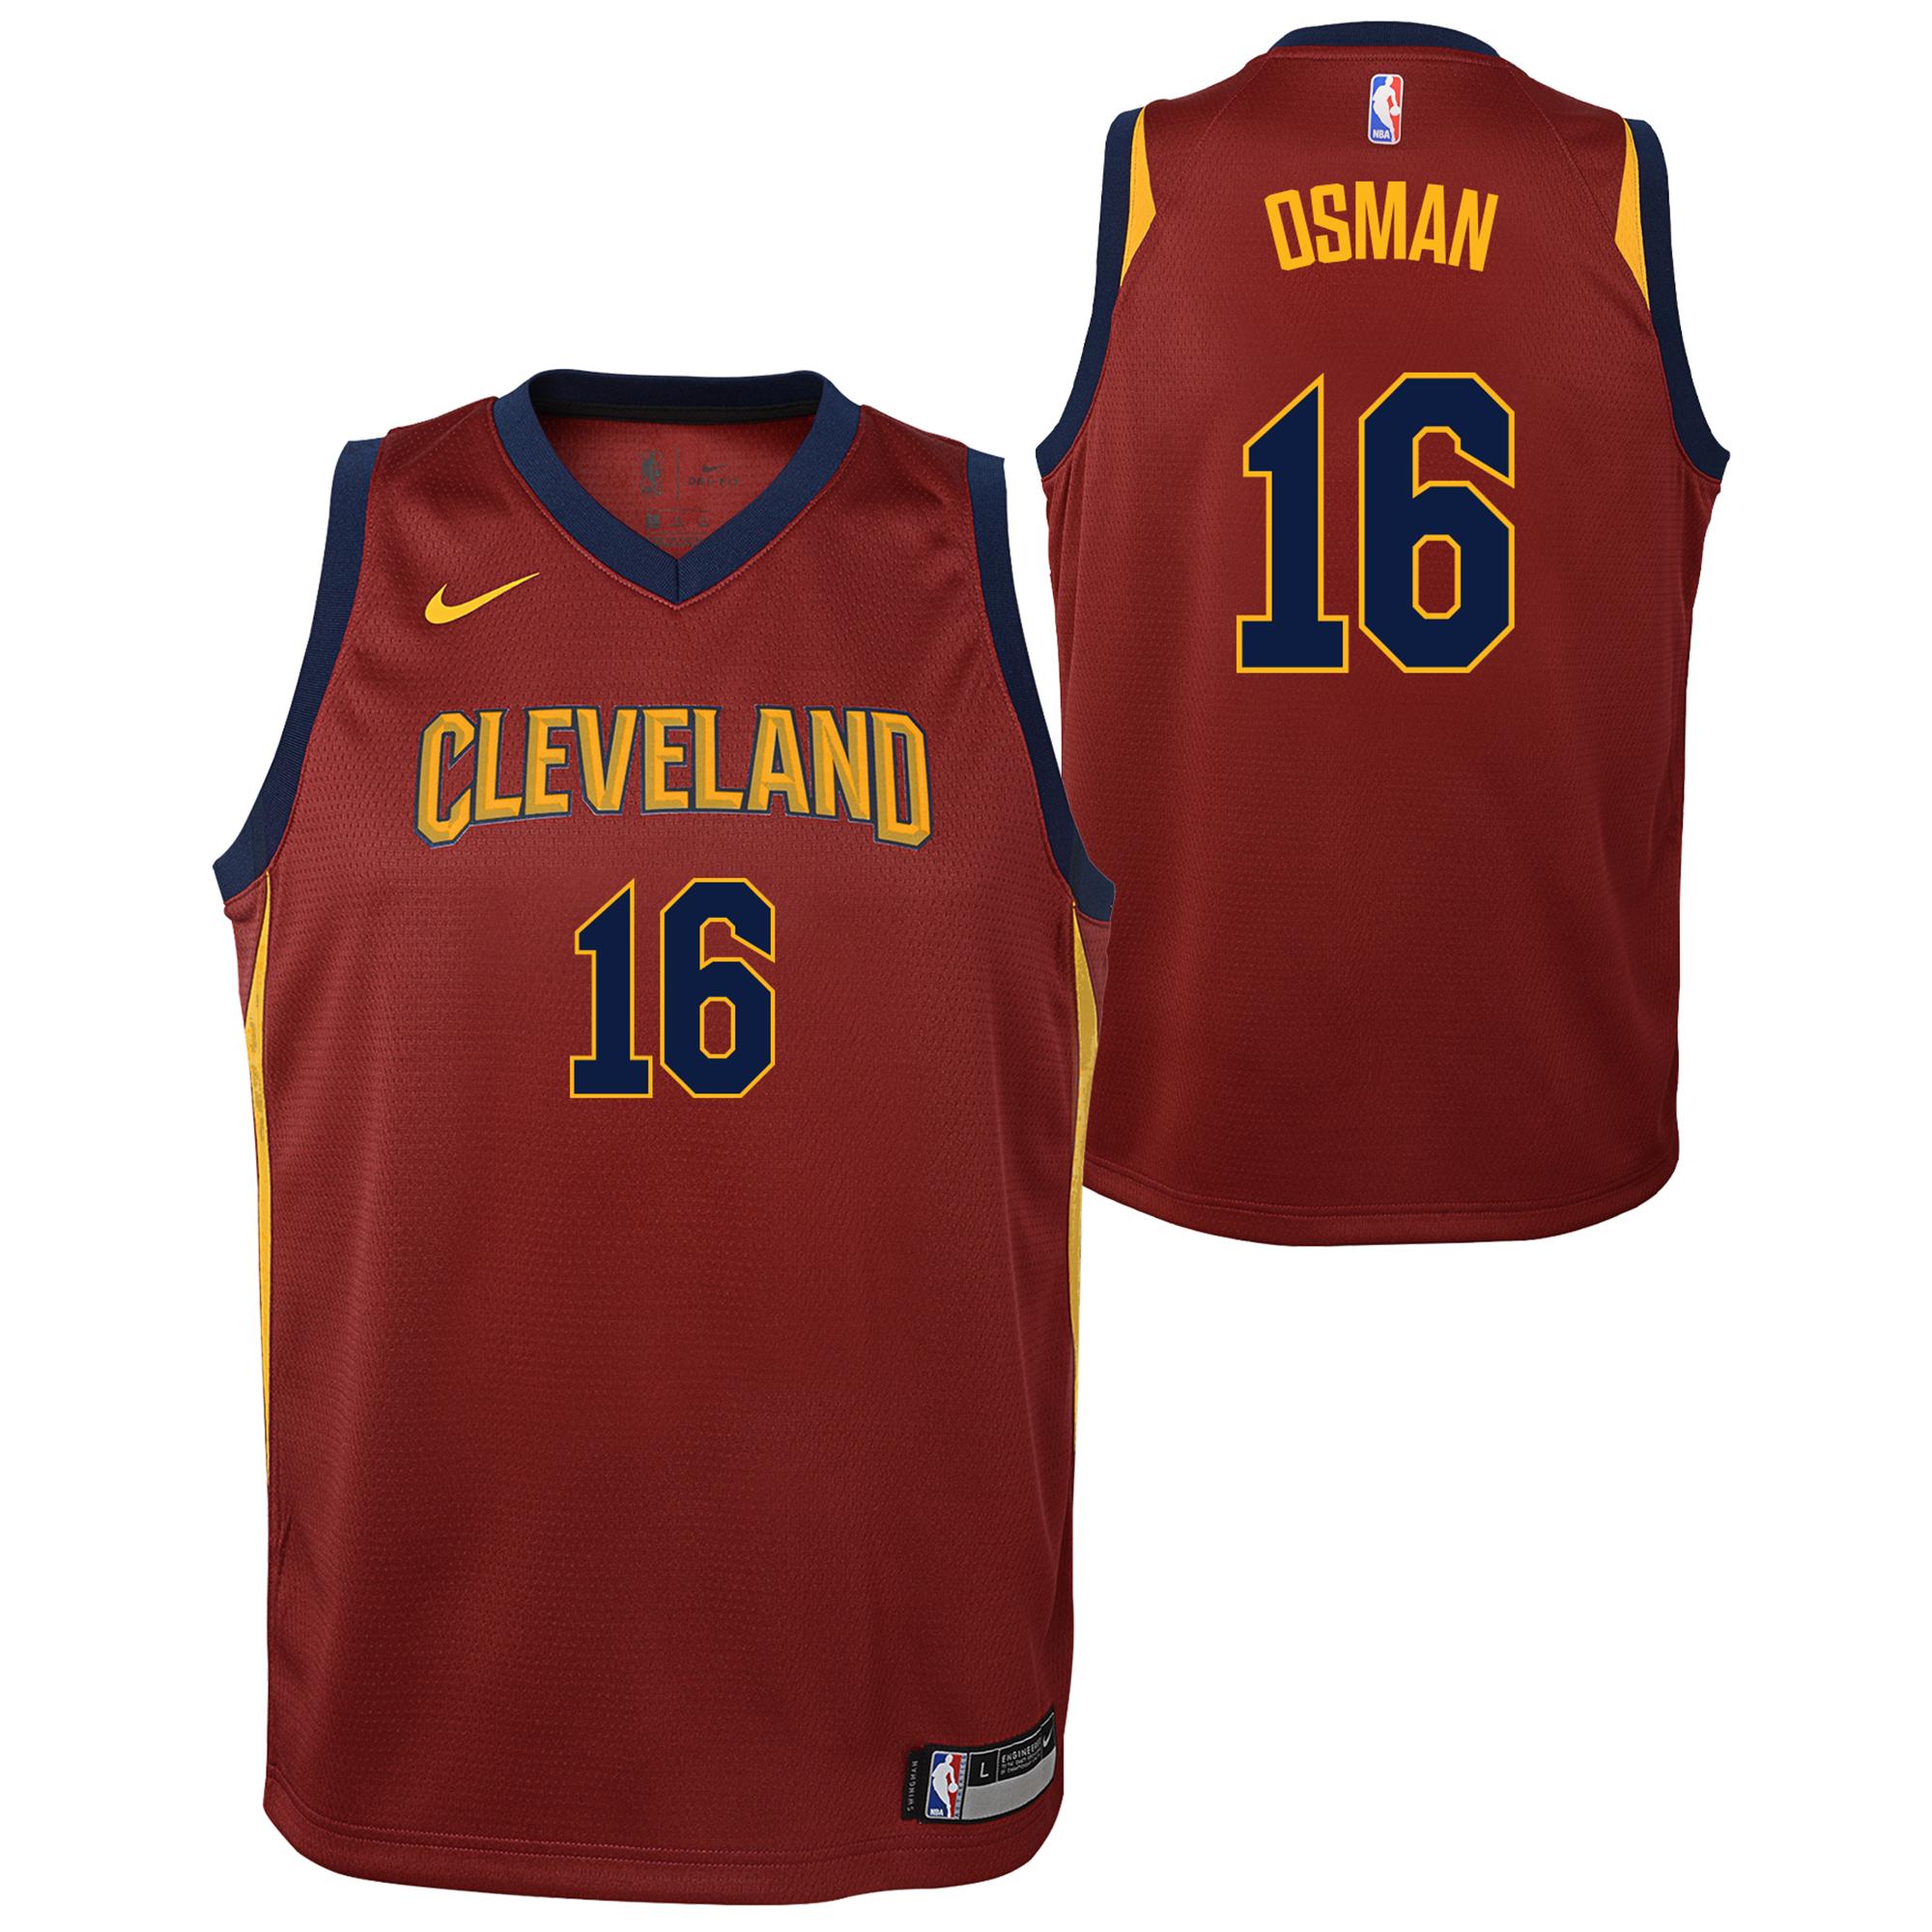 Cleveland Cavaliers Nike Icon Swingman Camiseta de la NBA - Cedi Osman - Adolescentes